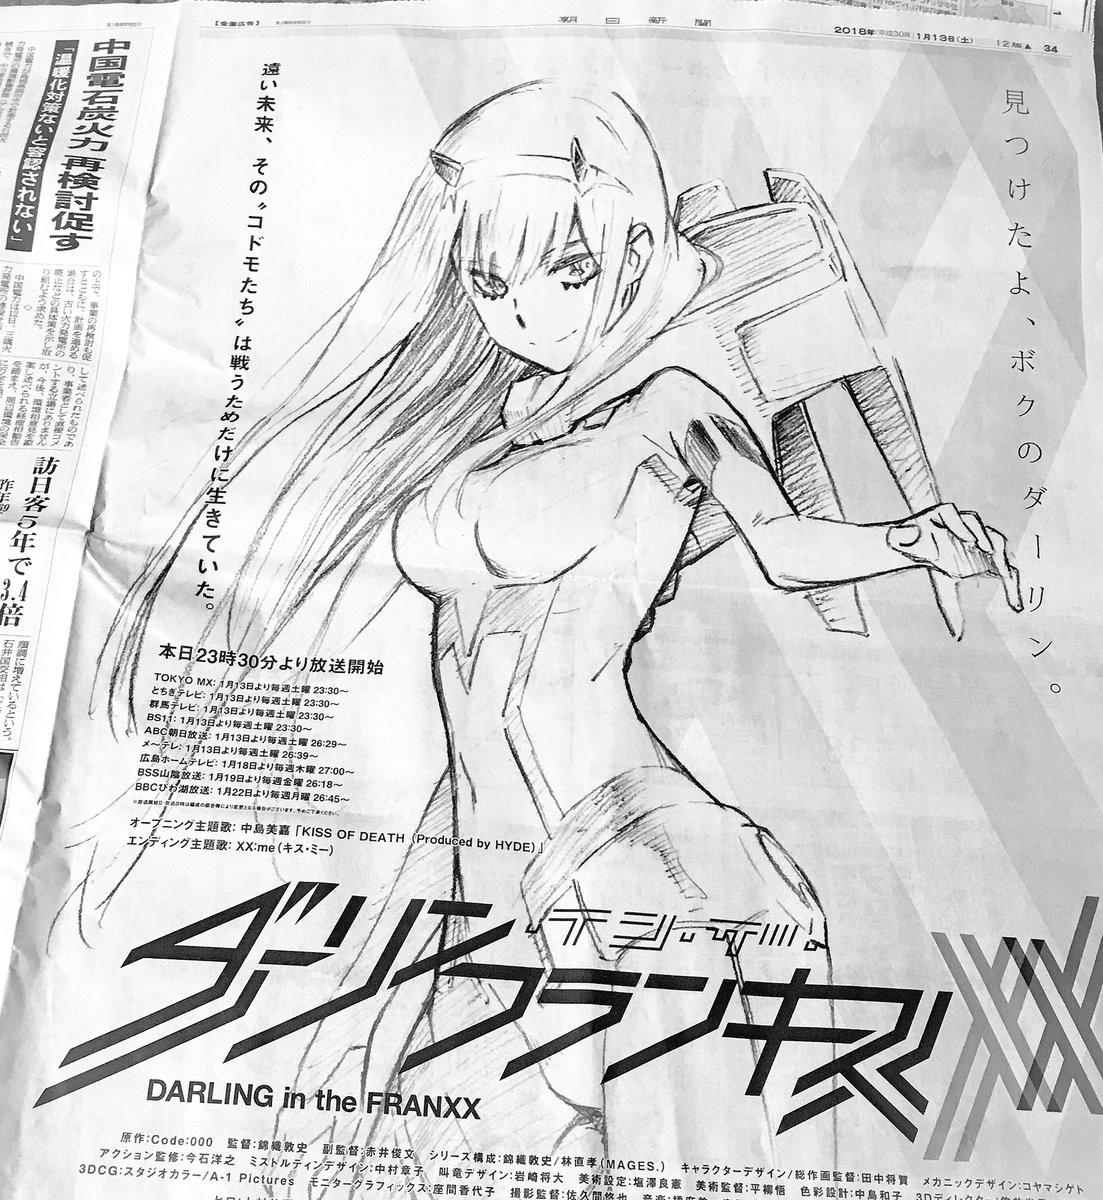 朝日新闻,Darling in the FranXX,HIRO